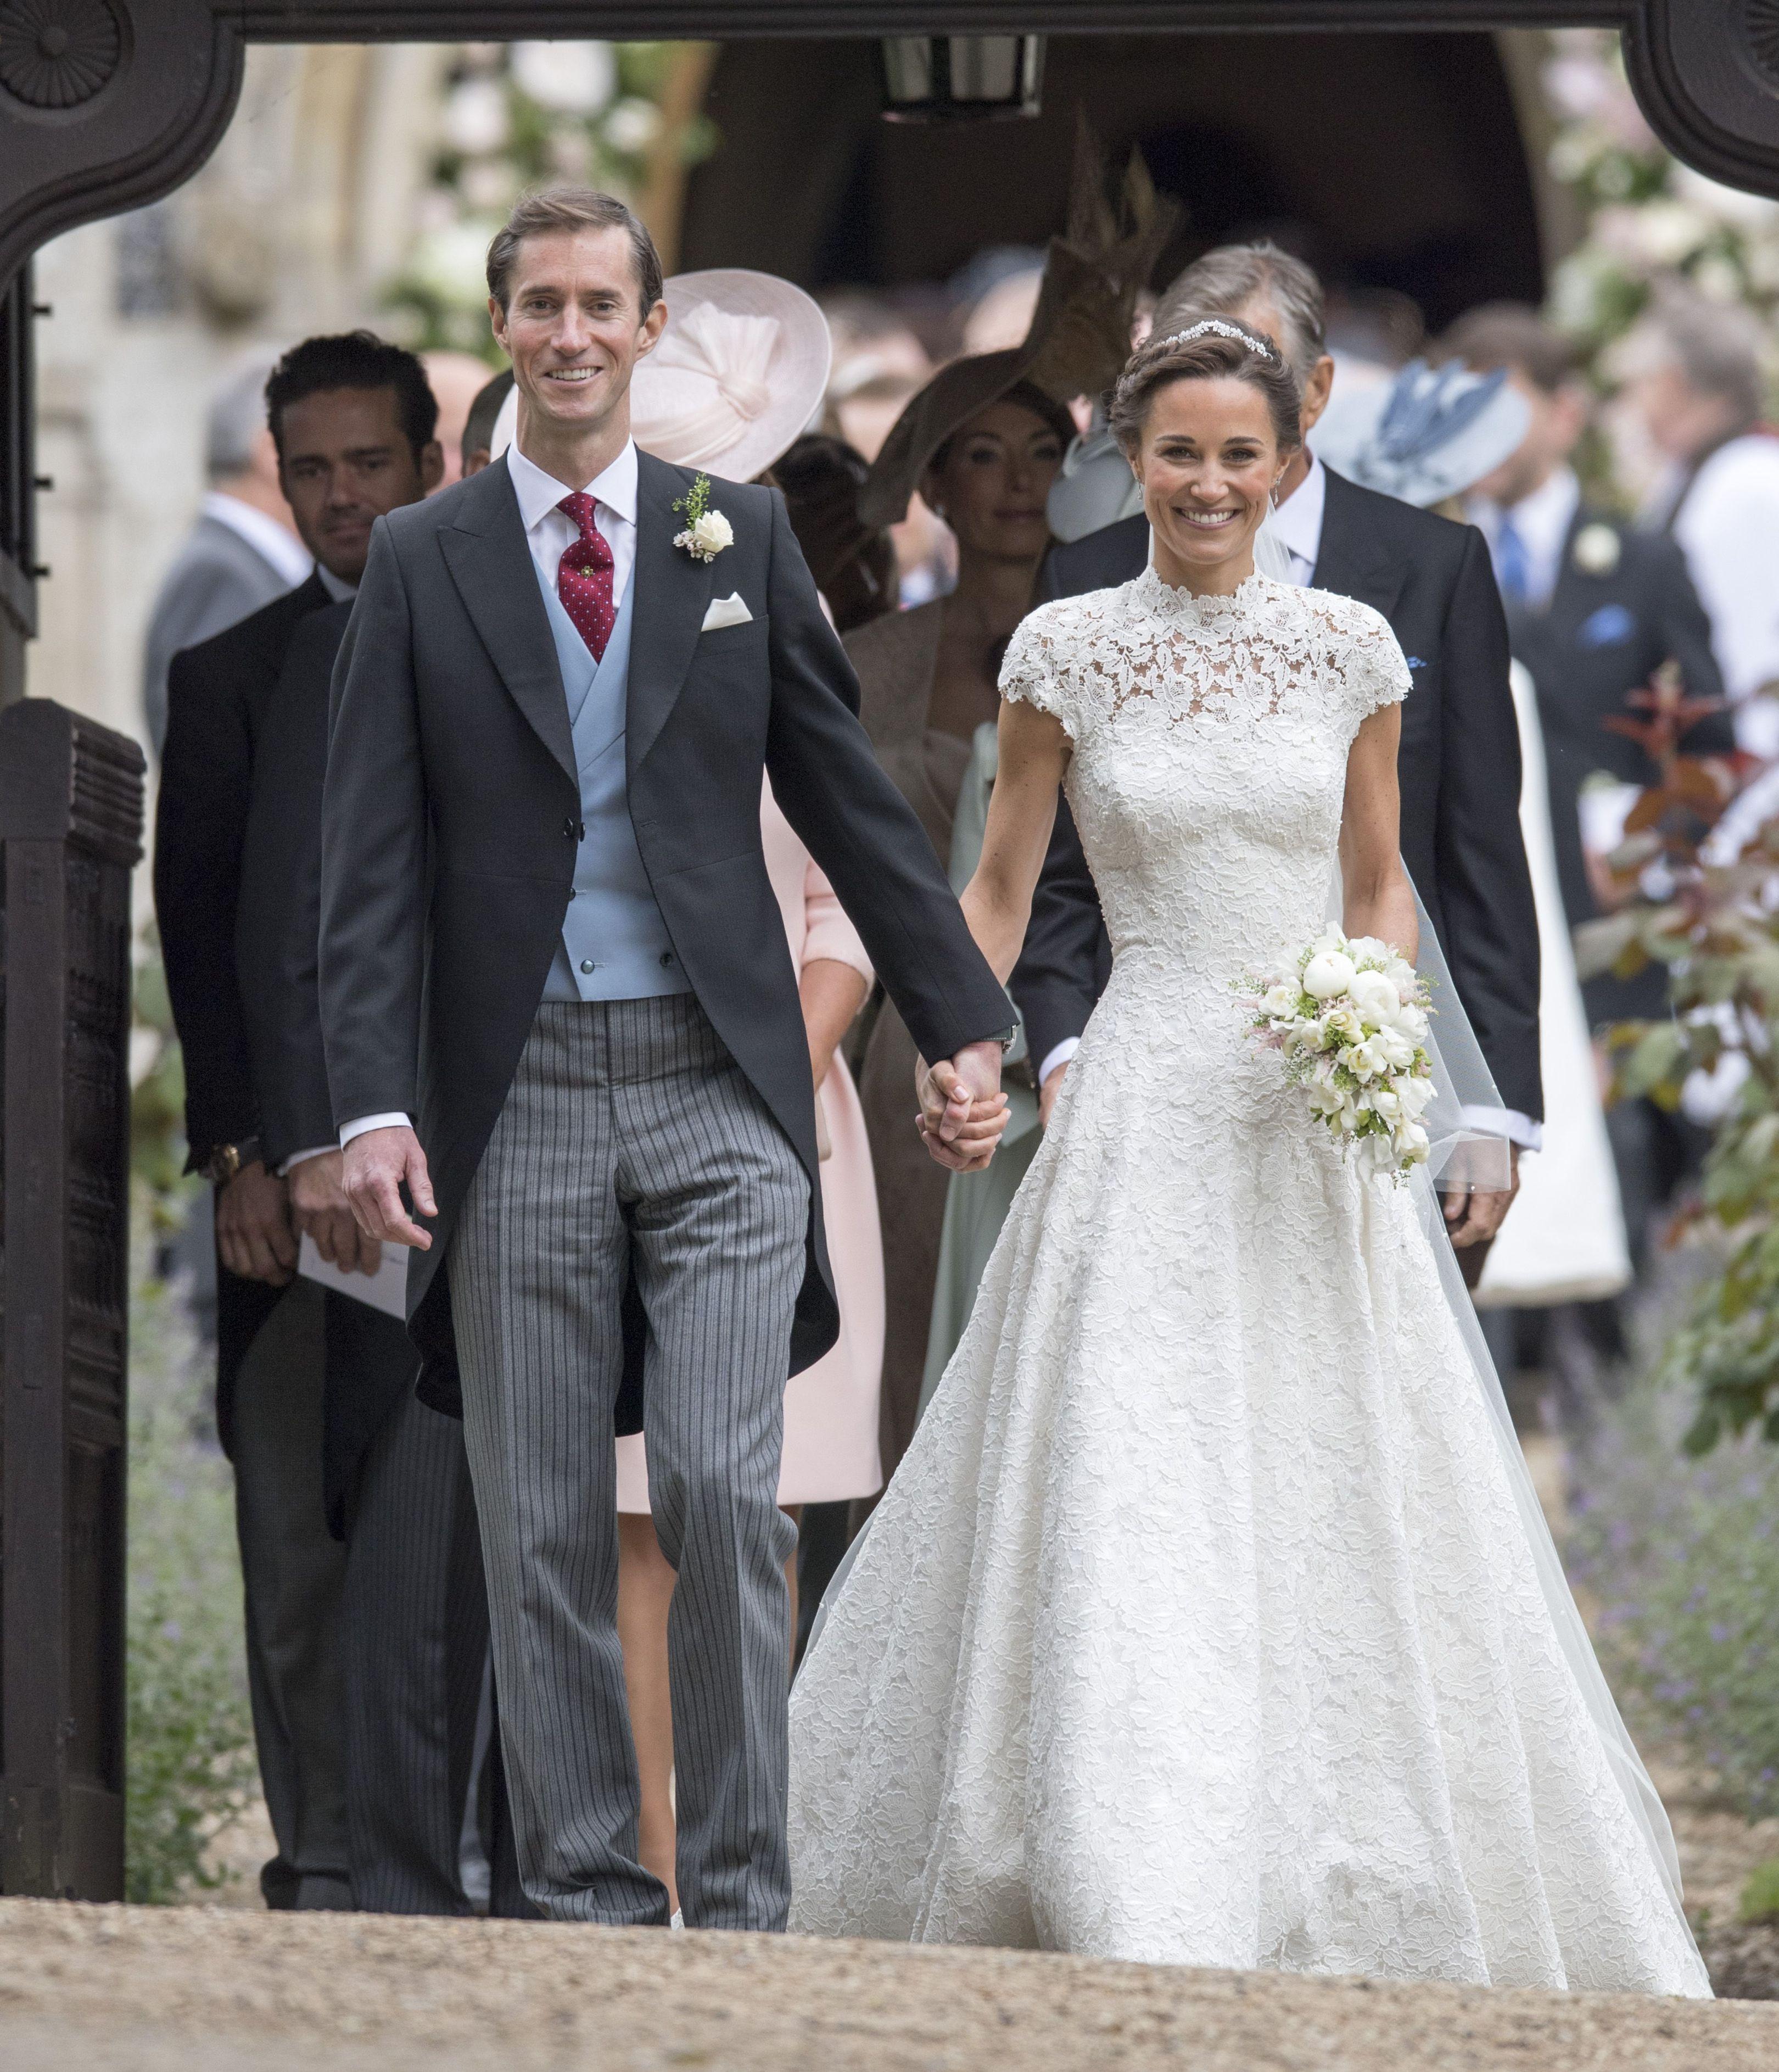 29 Iconic Celebrity Wedding Dresses: The Most Iconic Celebrity Wedding Dresses Of All Time